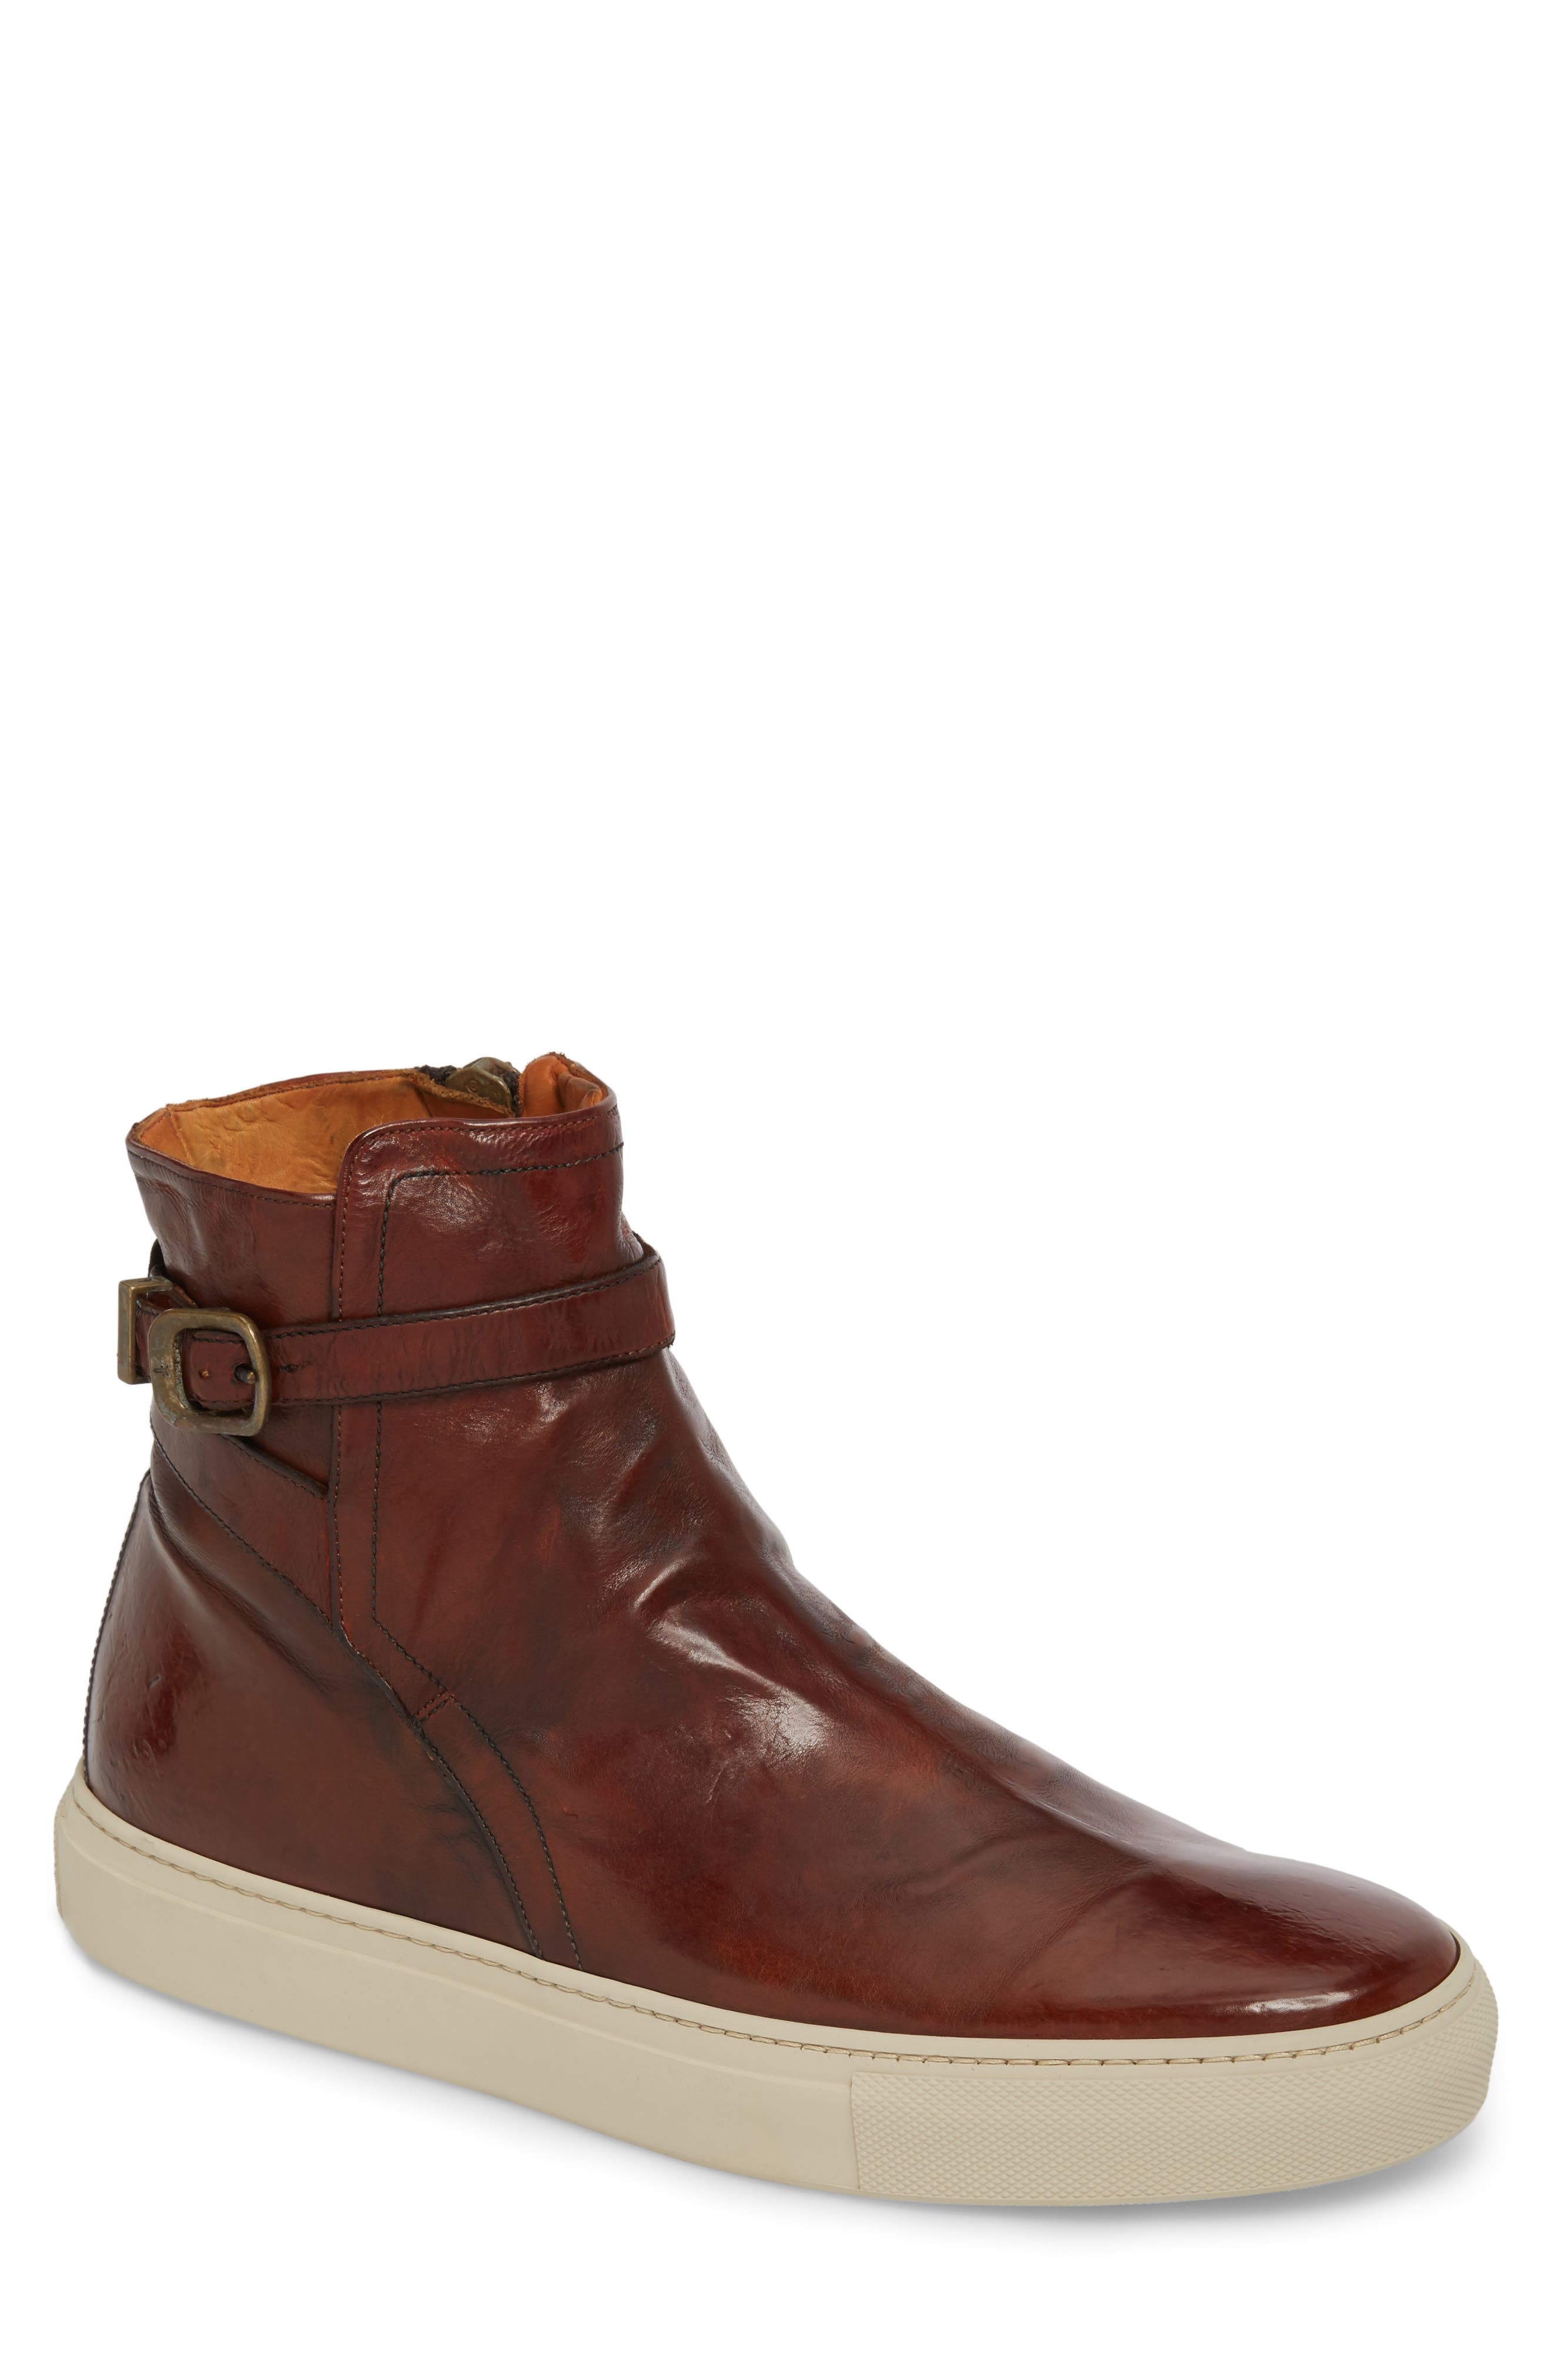 Owen Jodhpur High Top Sneaker,                         Main,                         color, Redwood Leather